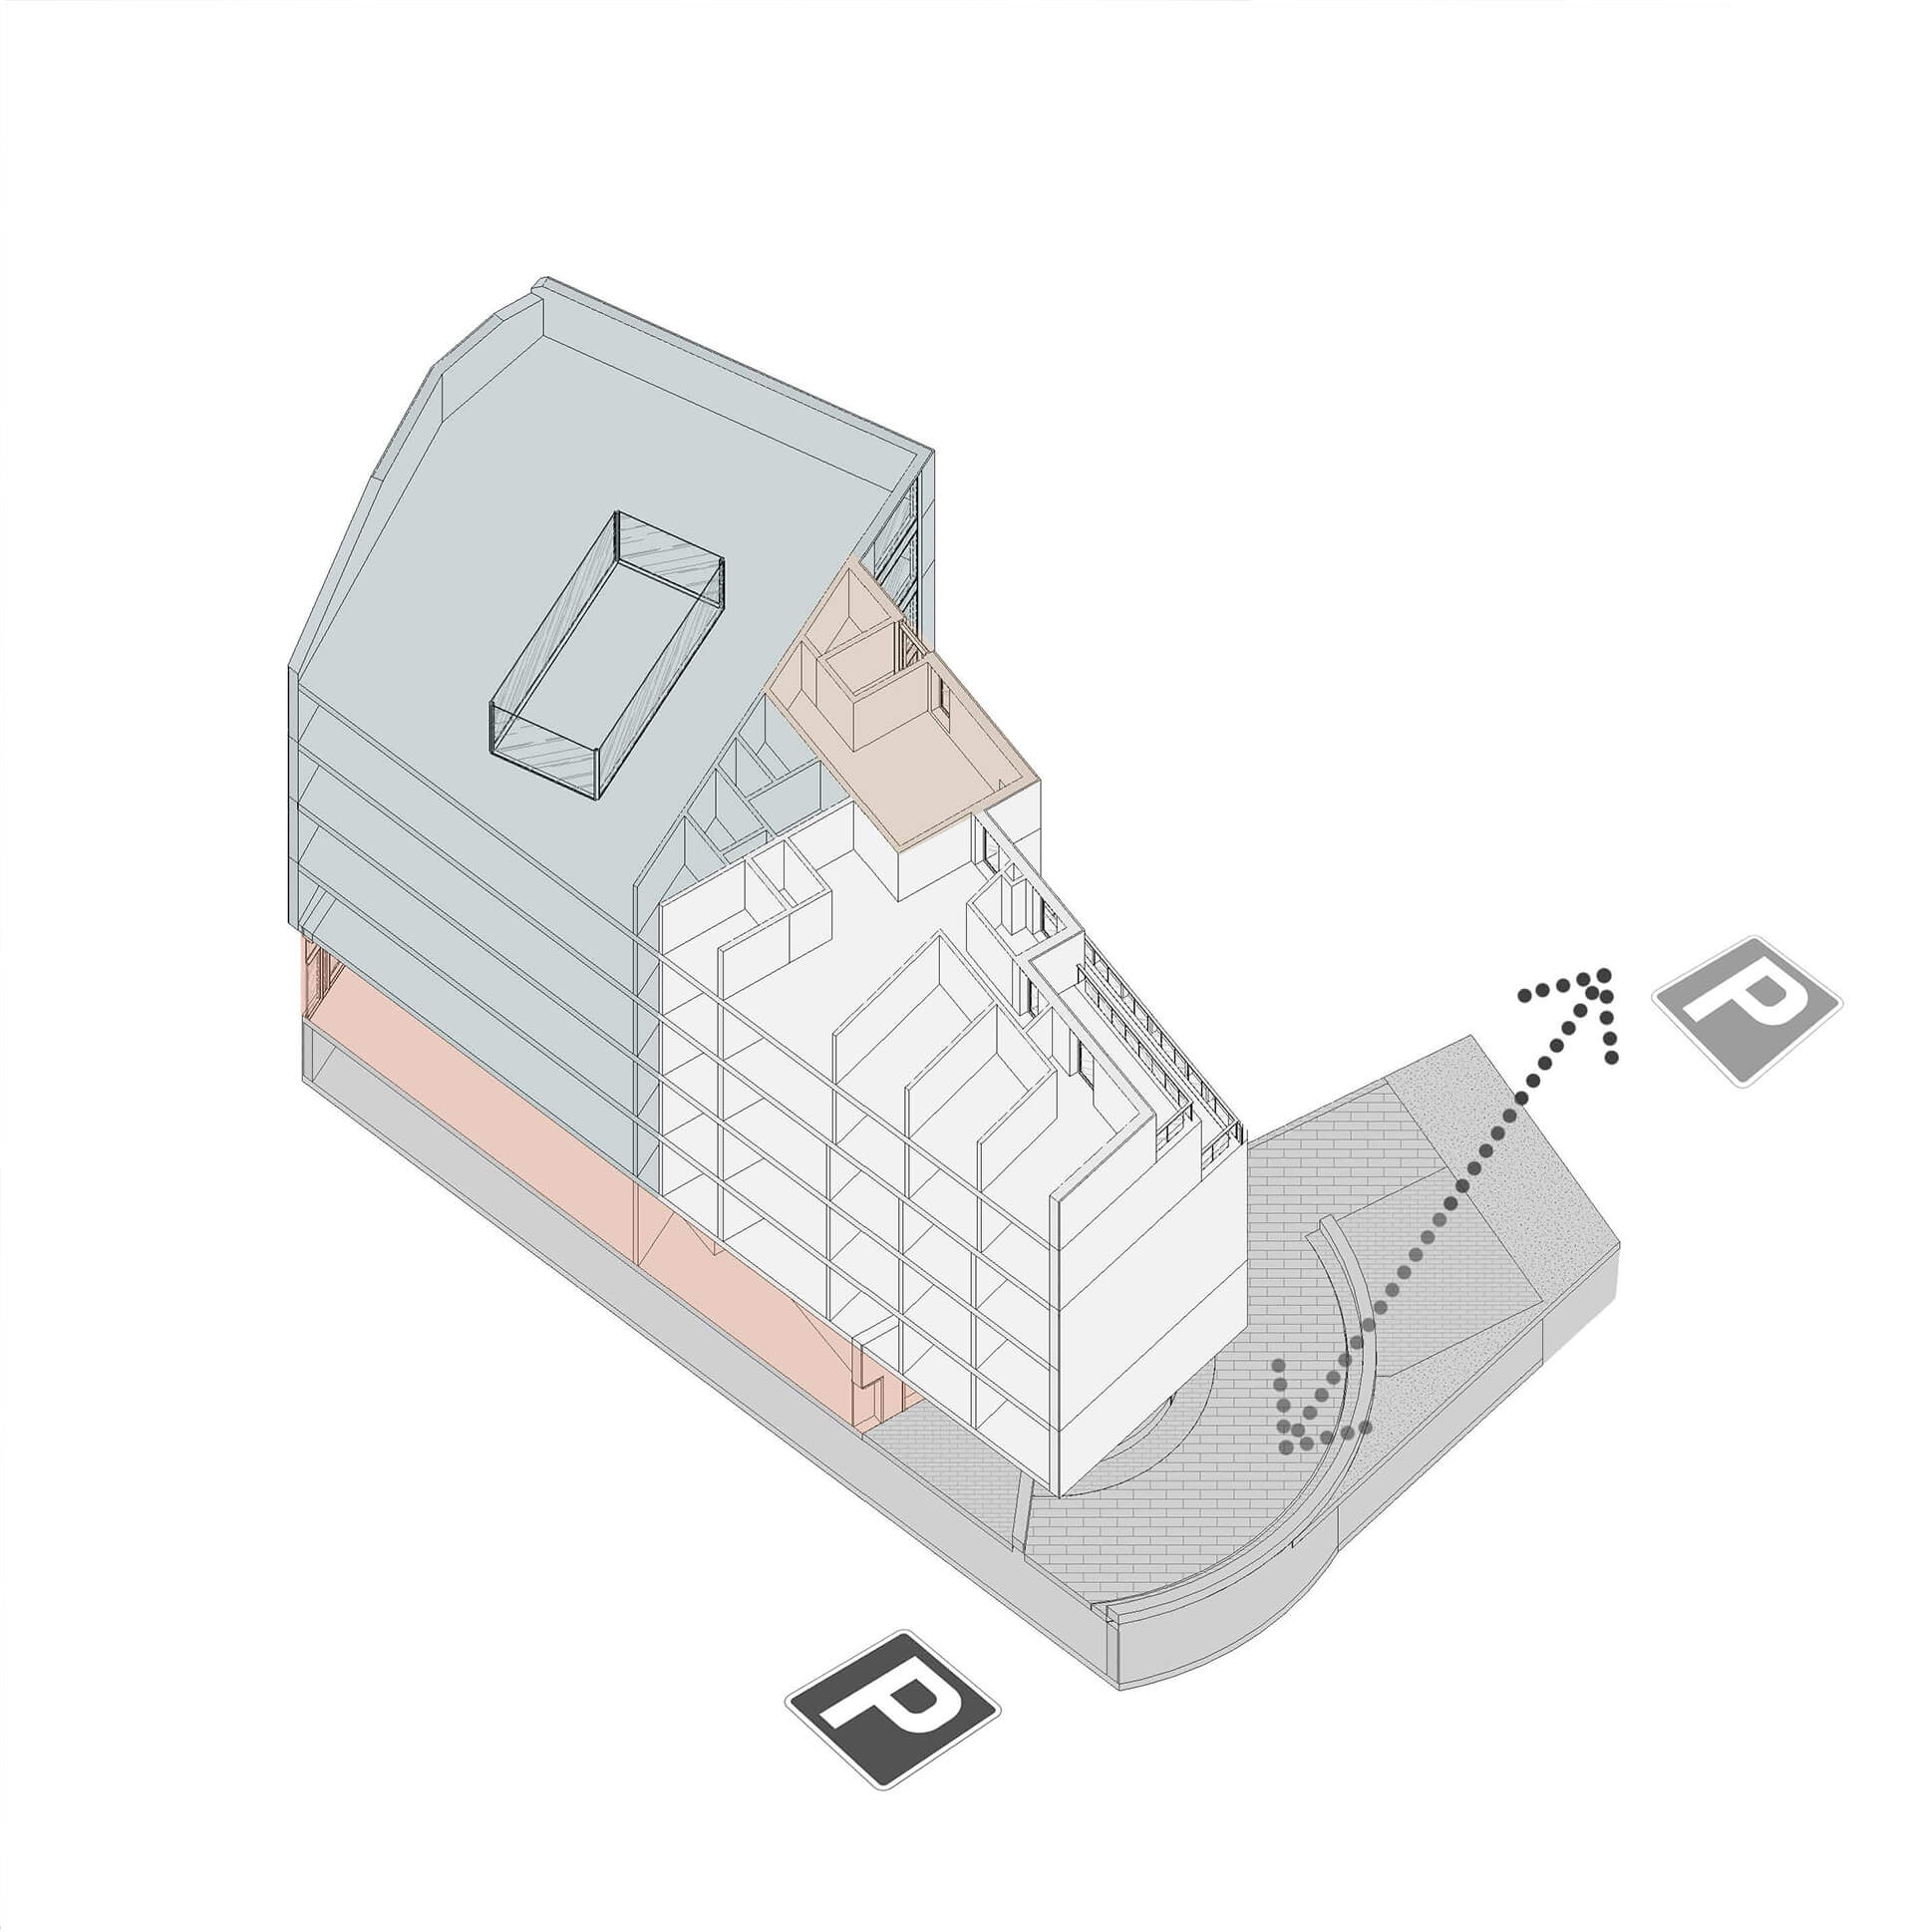 https://laagaarchitects.lv/wp-content/uploads/2019/11/03-02-4-KrB30.jpg